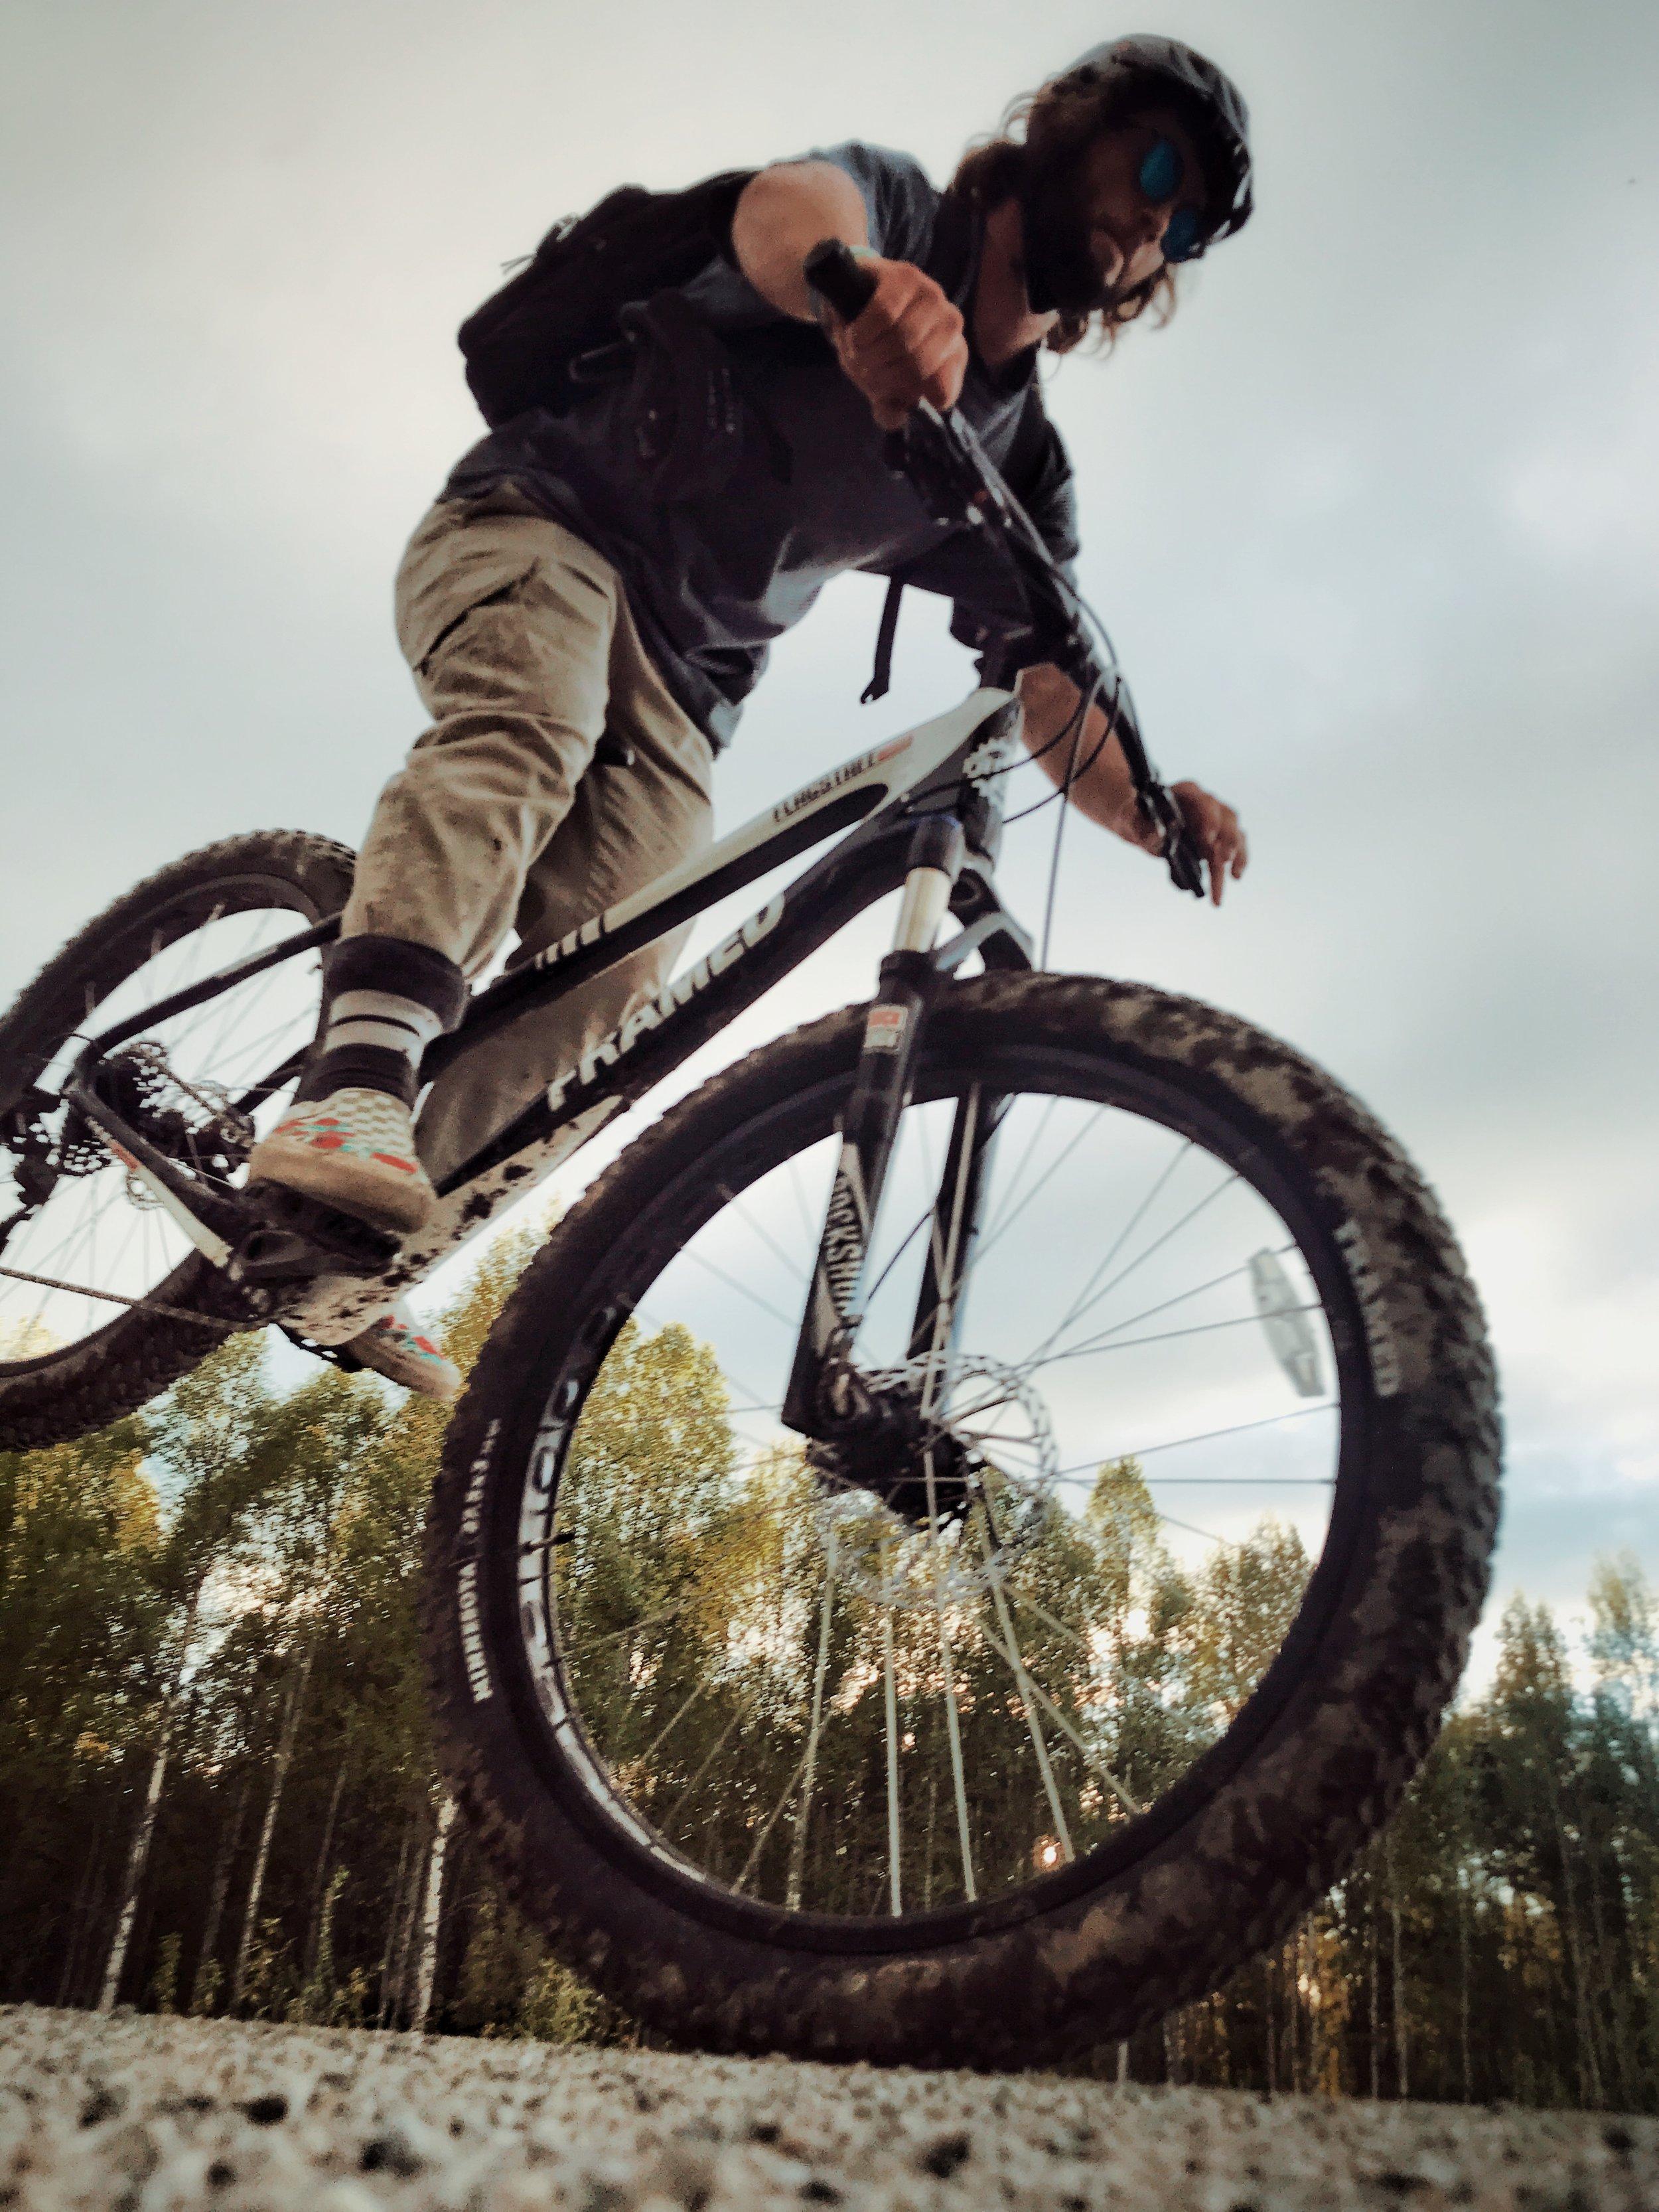 Rental bike - Framed Flagstaff, has fantastic front suspension, plus size wheels and disc brakes.